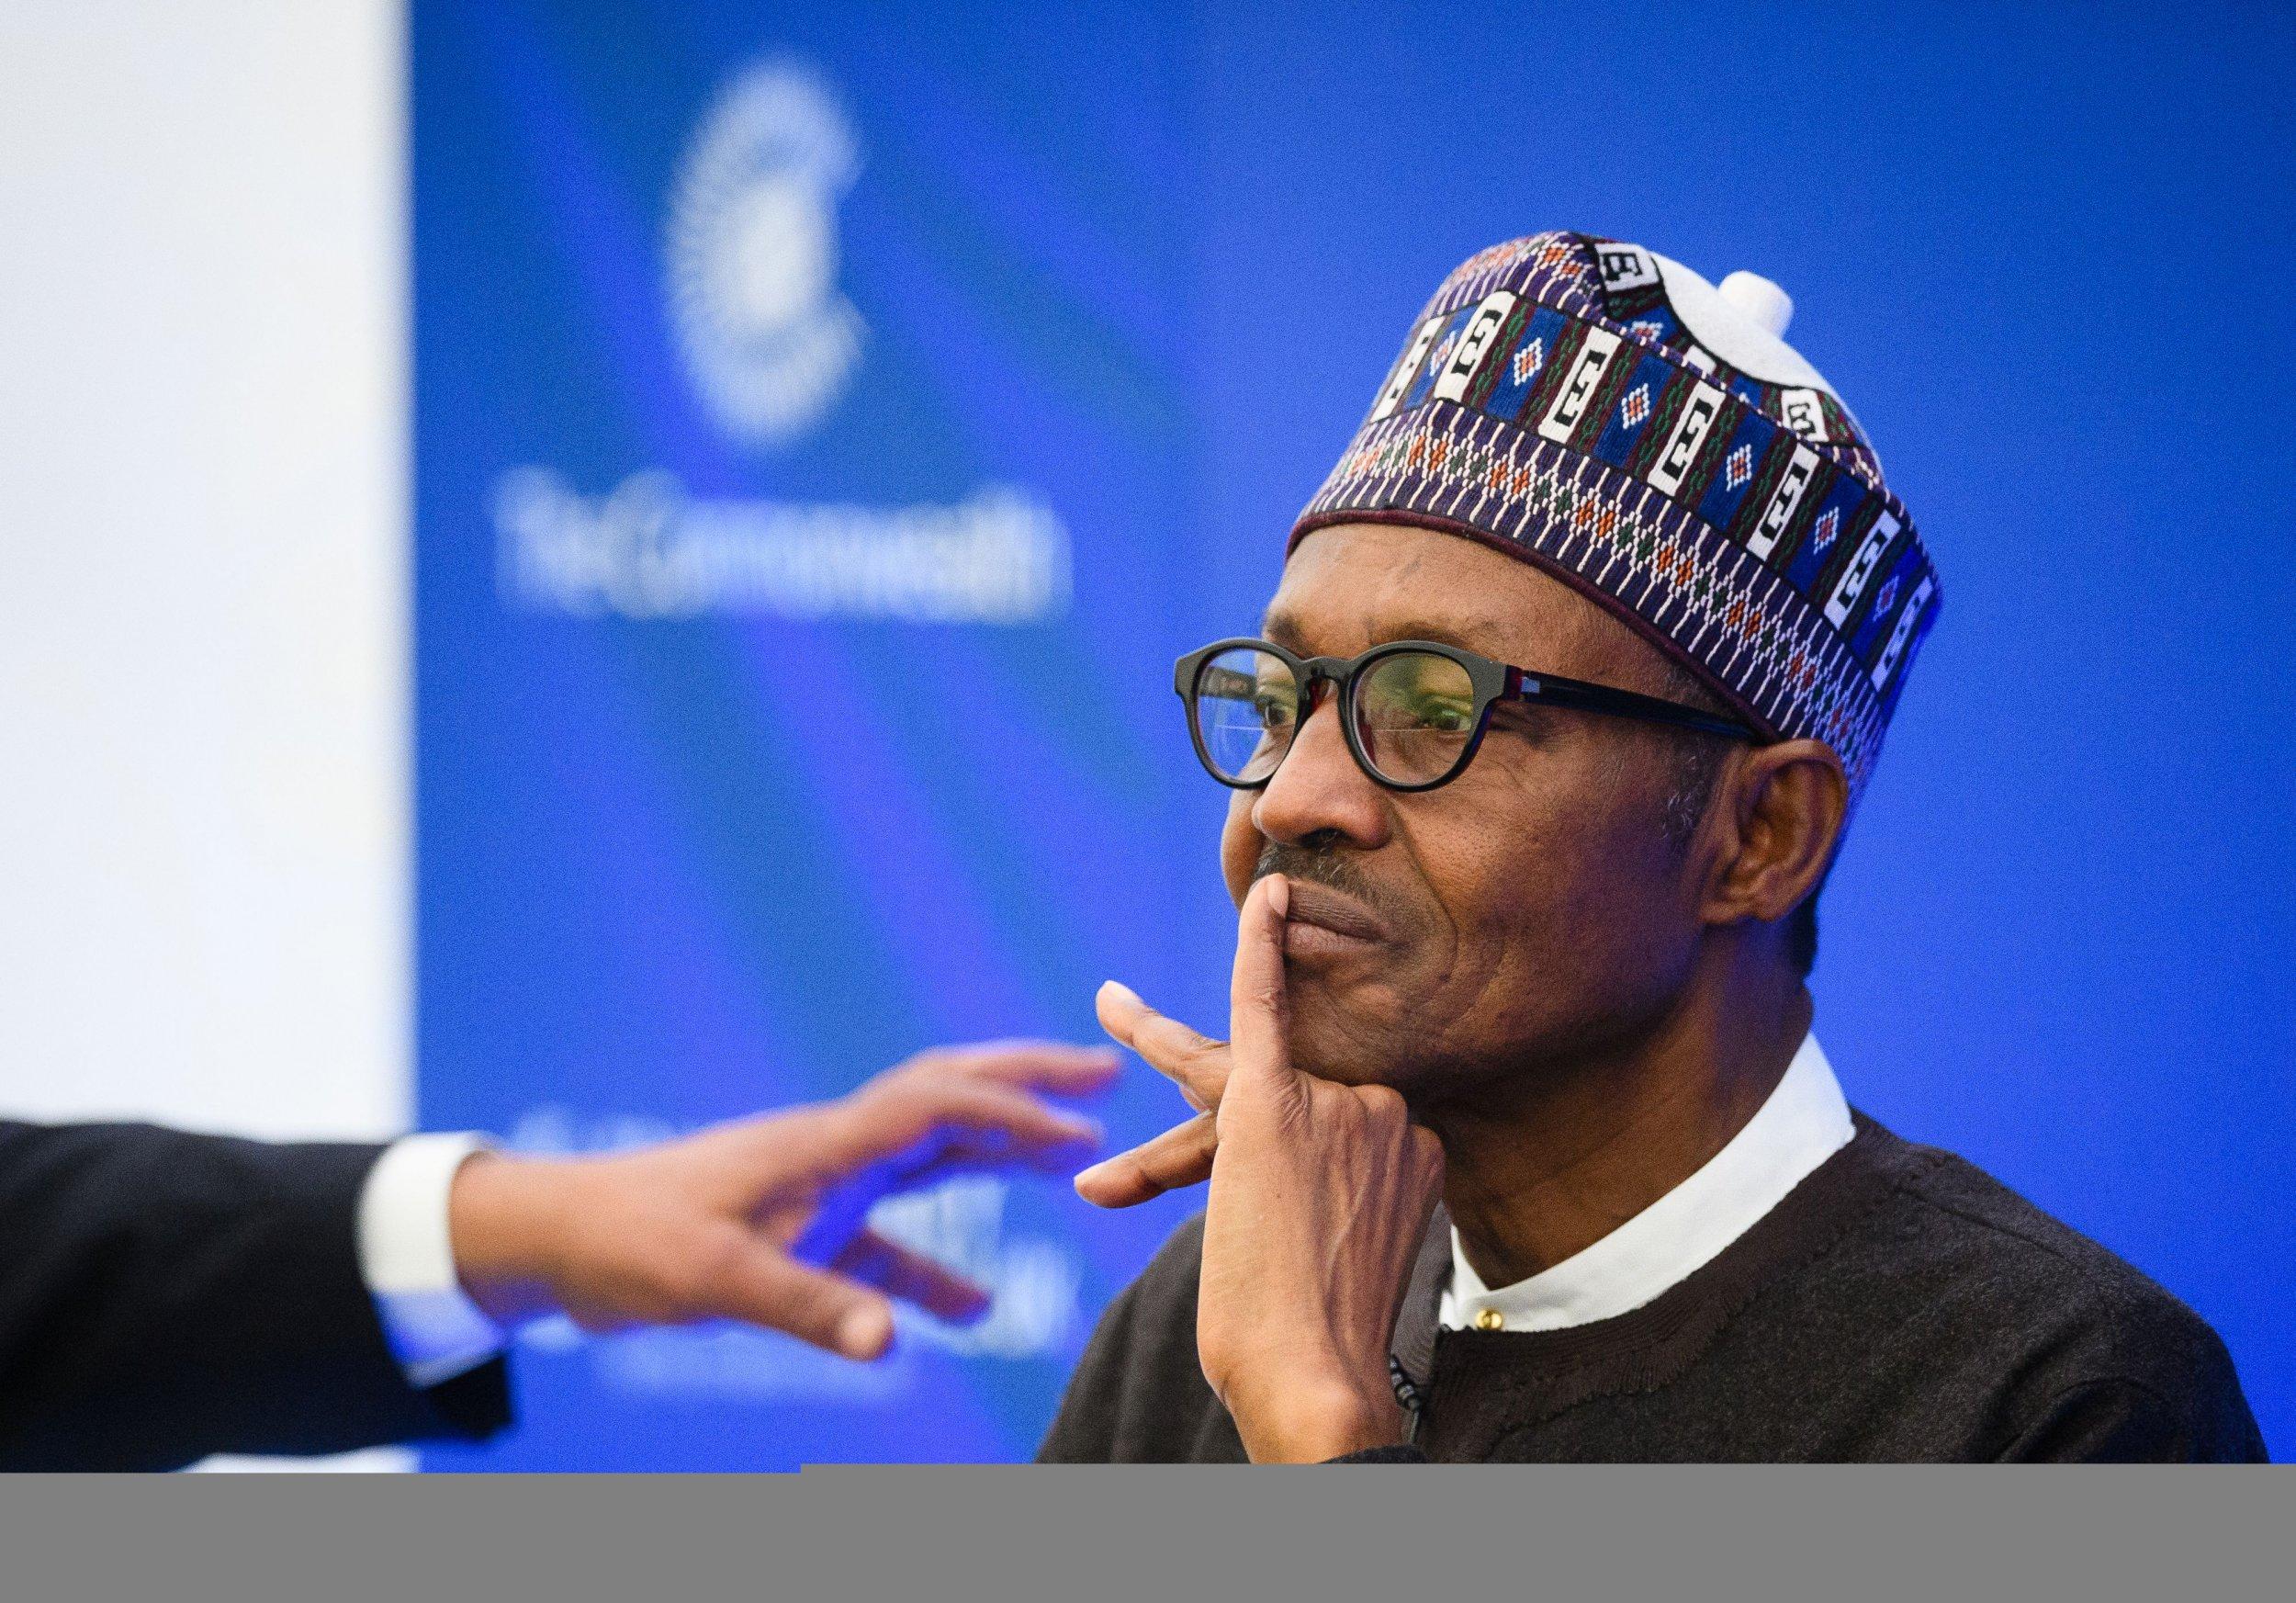 Nigerian President Muhammadu Buhari at anti-corruption summit.